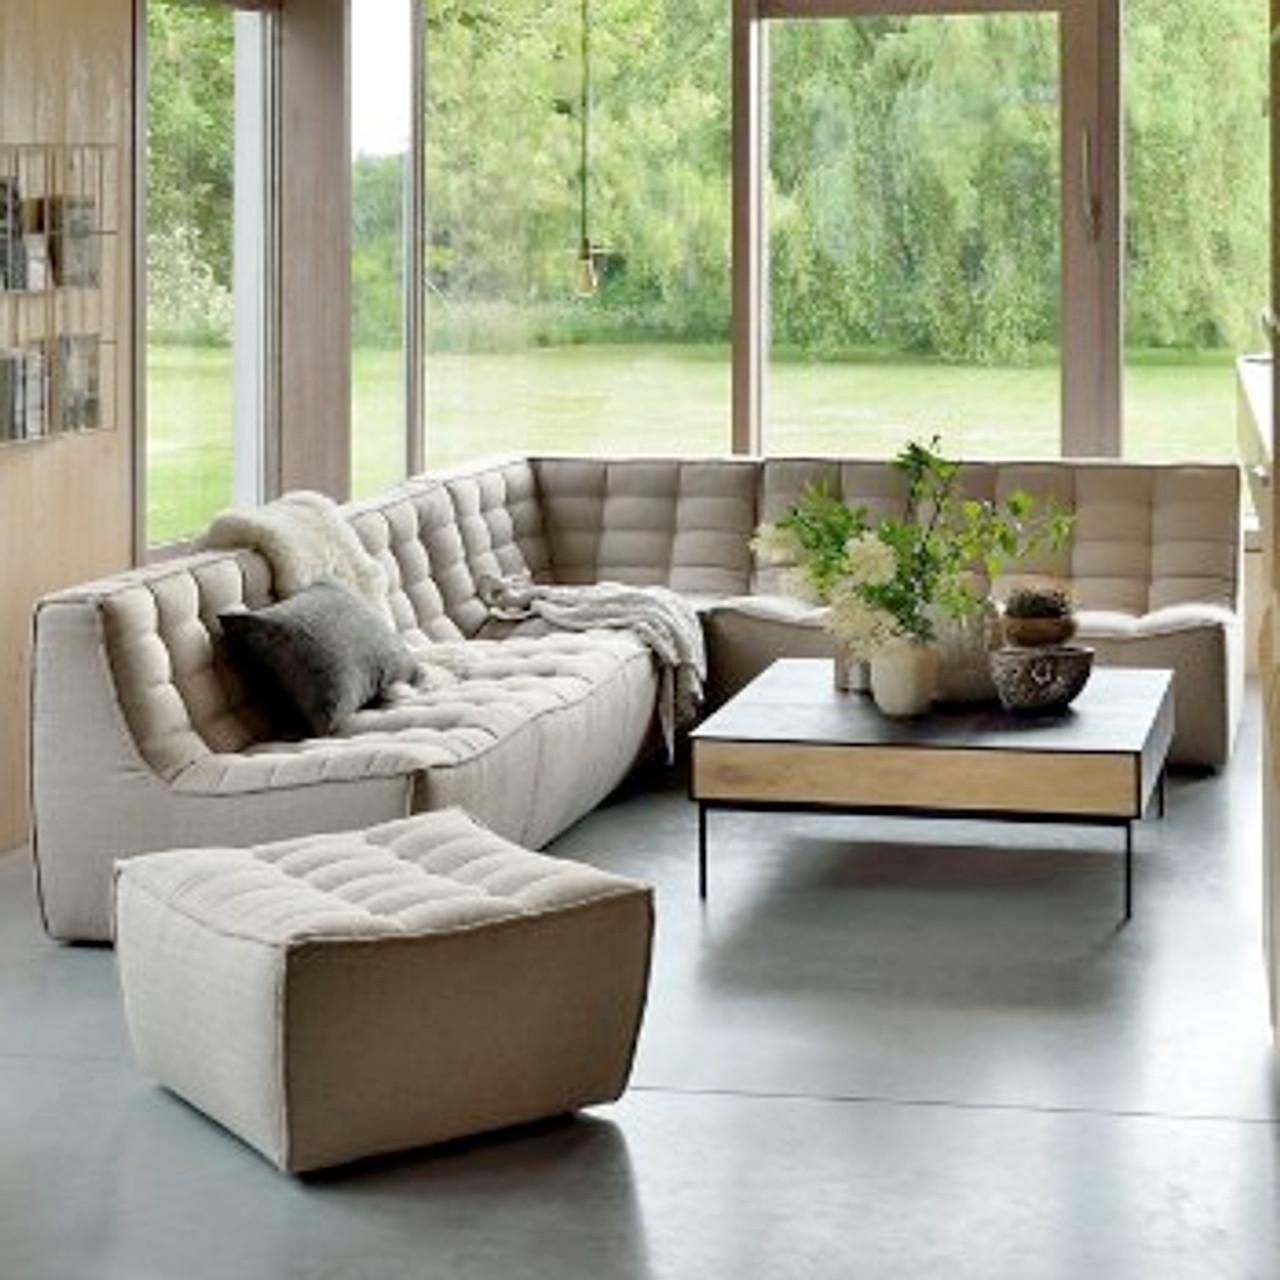 Roset Modern Modular Sectional Sofa - 3 Seater